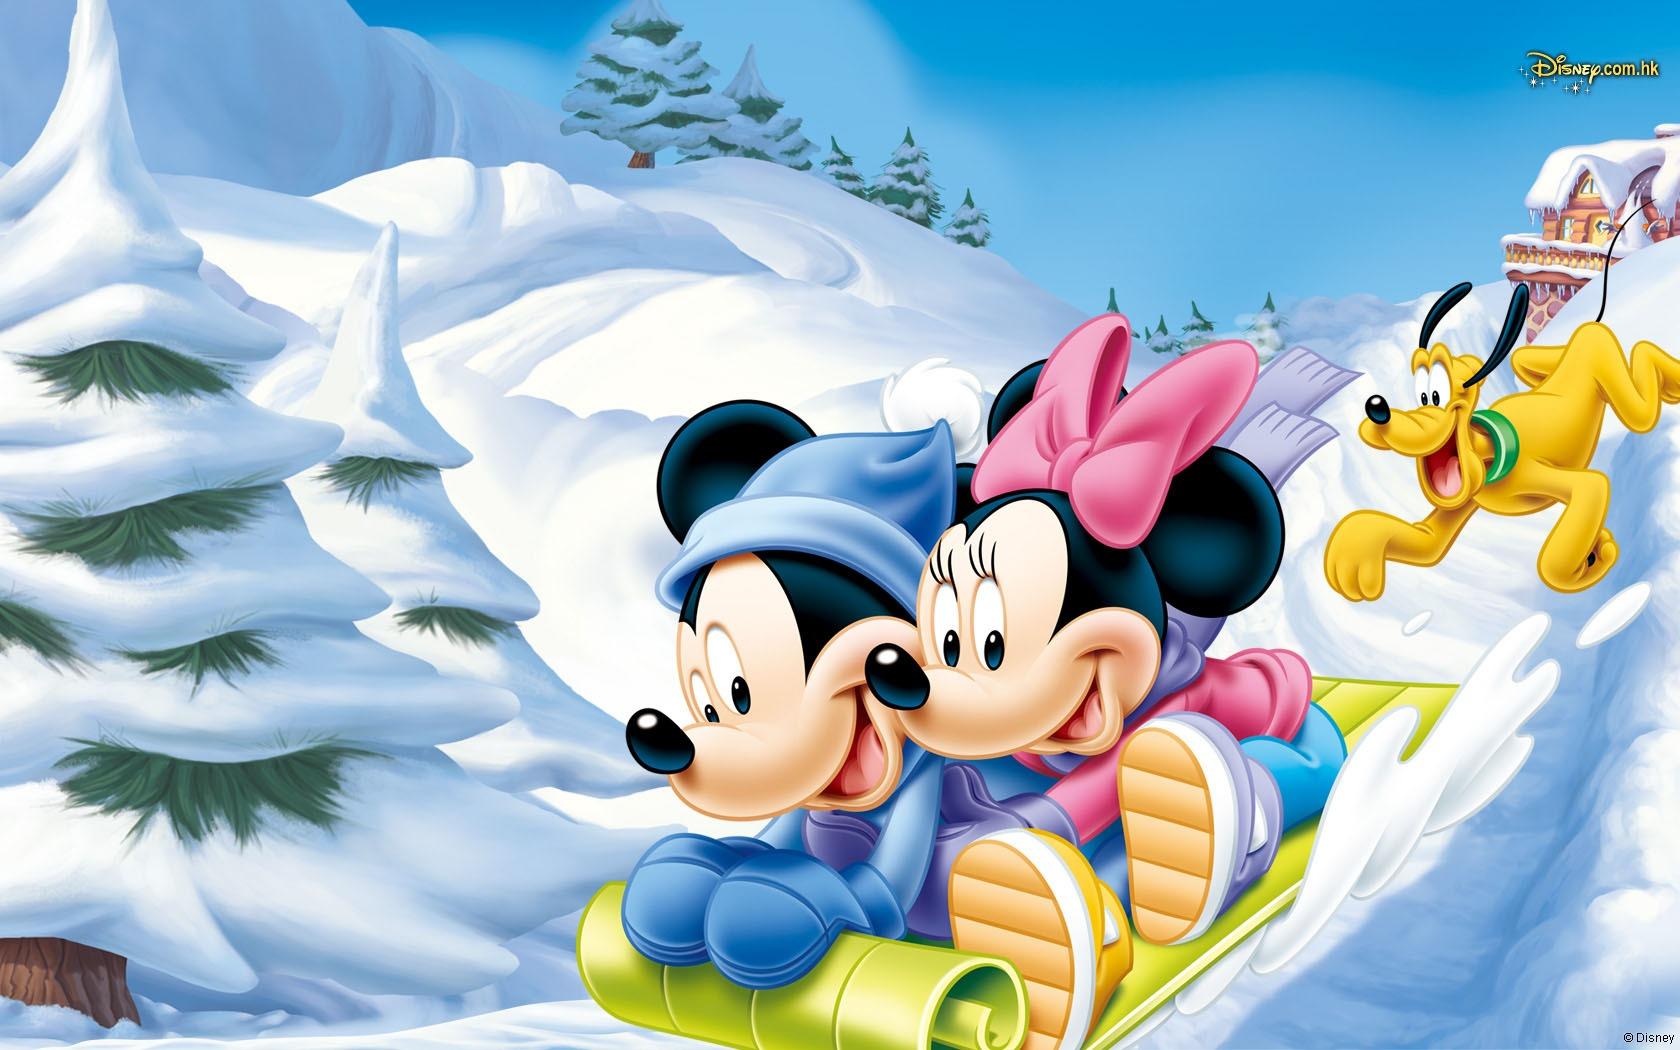 Download image Wallpaper Hd Disney Cartoon Mickey Desktop PC Android 1680x1050